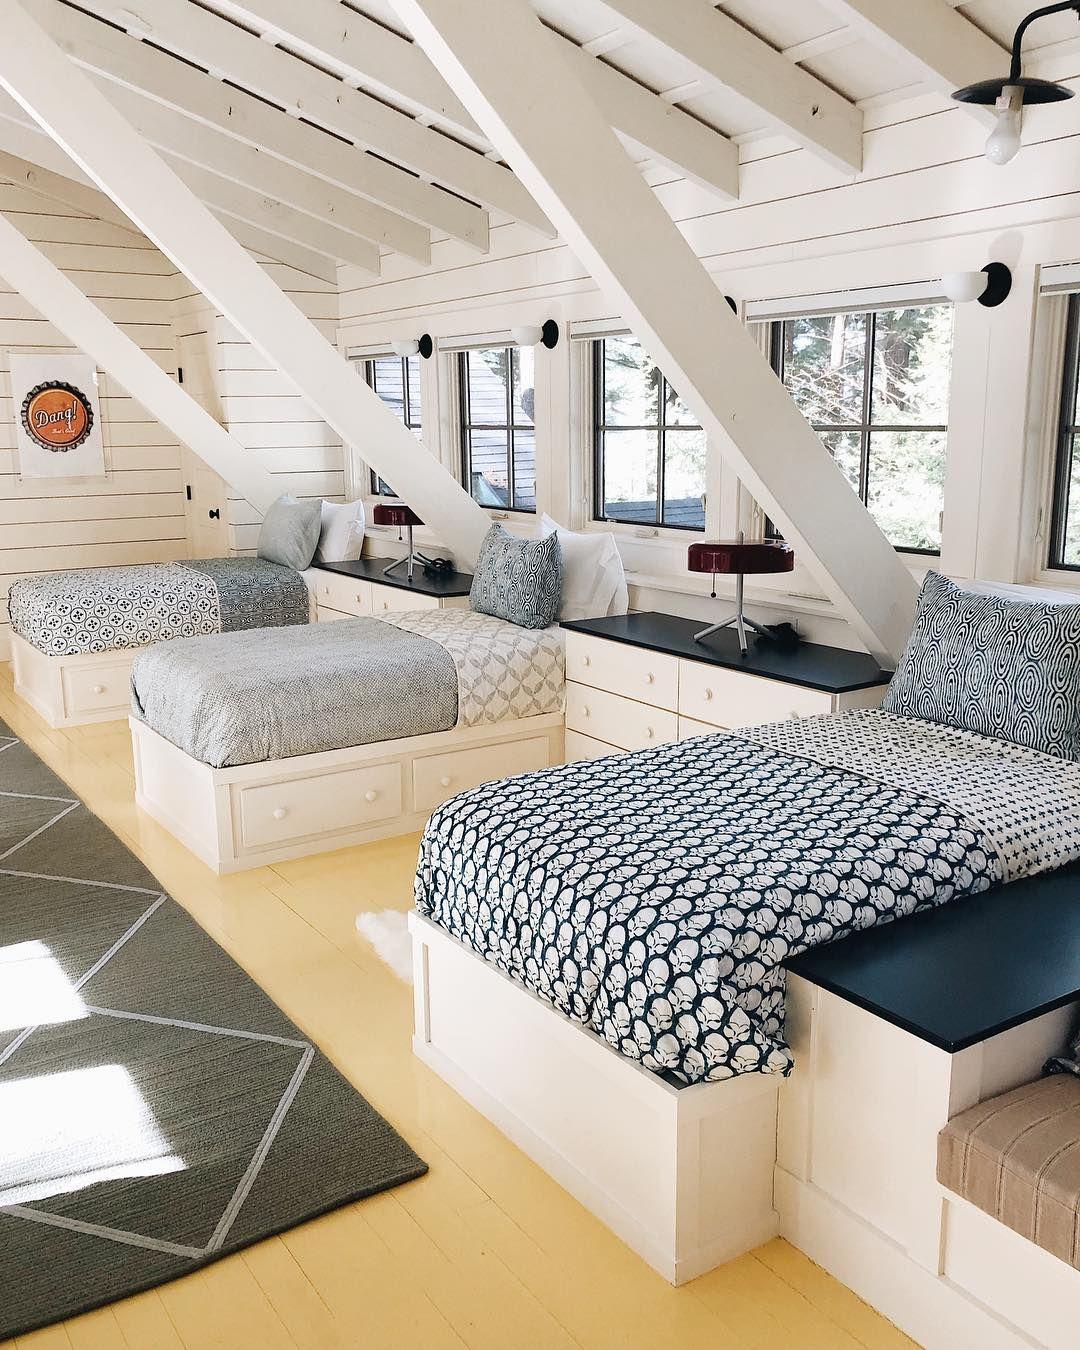 Form Rug Moss Wool Sea Sunbrella Custom Design Runner Attic Bedroom Kids Home Bunk Room